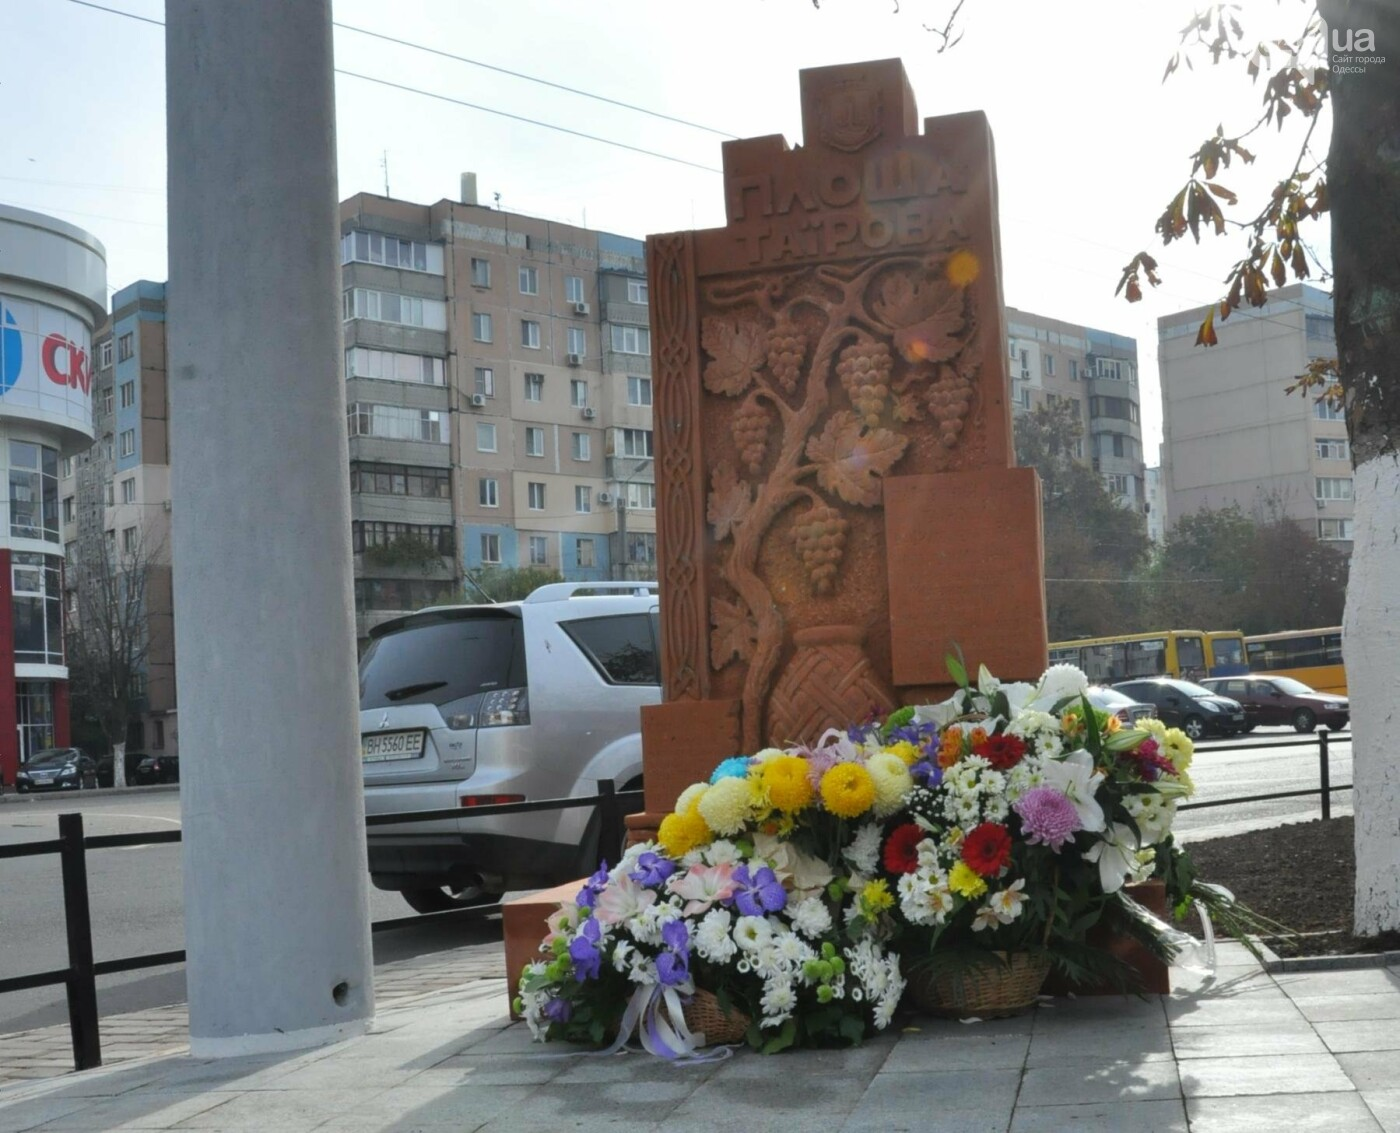 В Одессе увековечили имя человека-поселка (ФОТО), фото-3